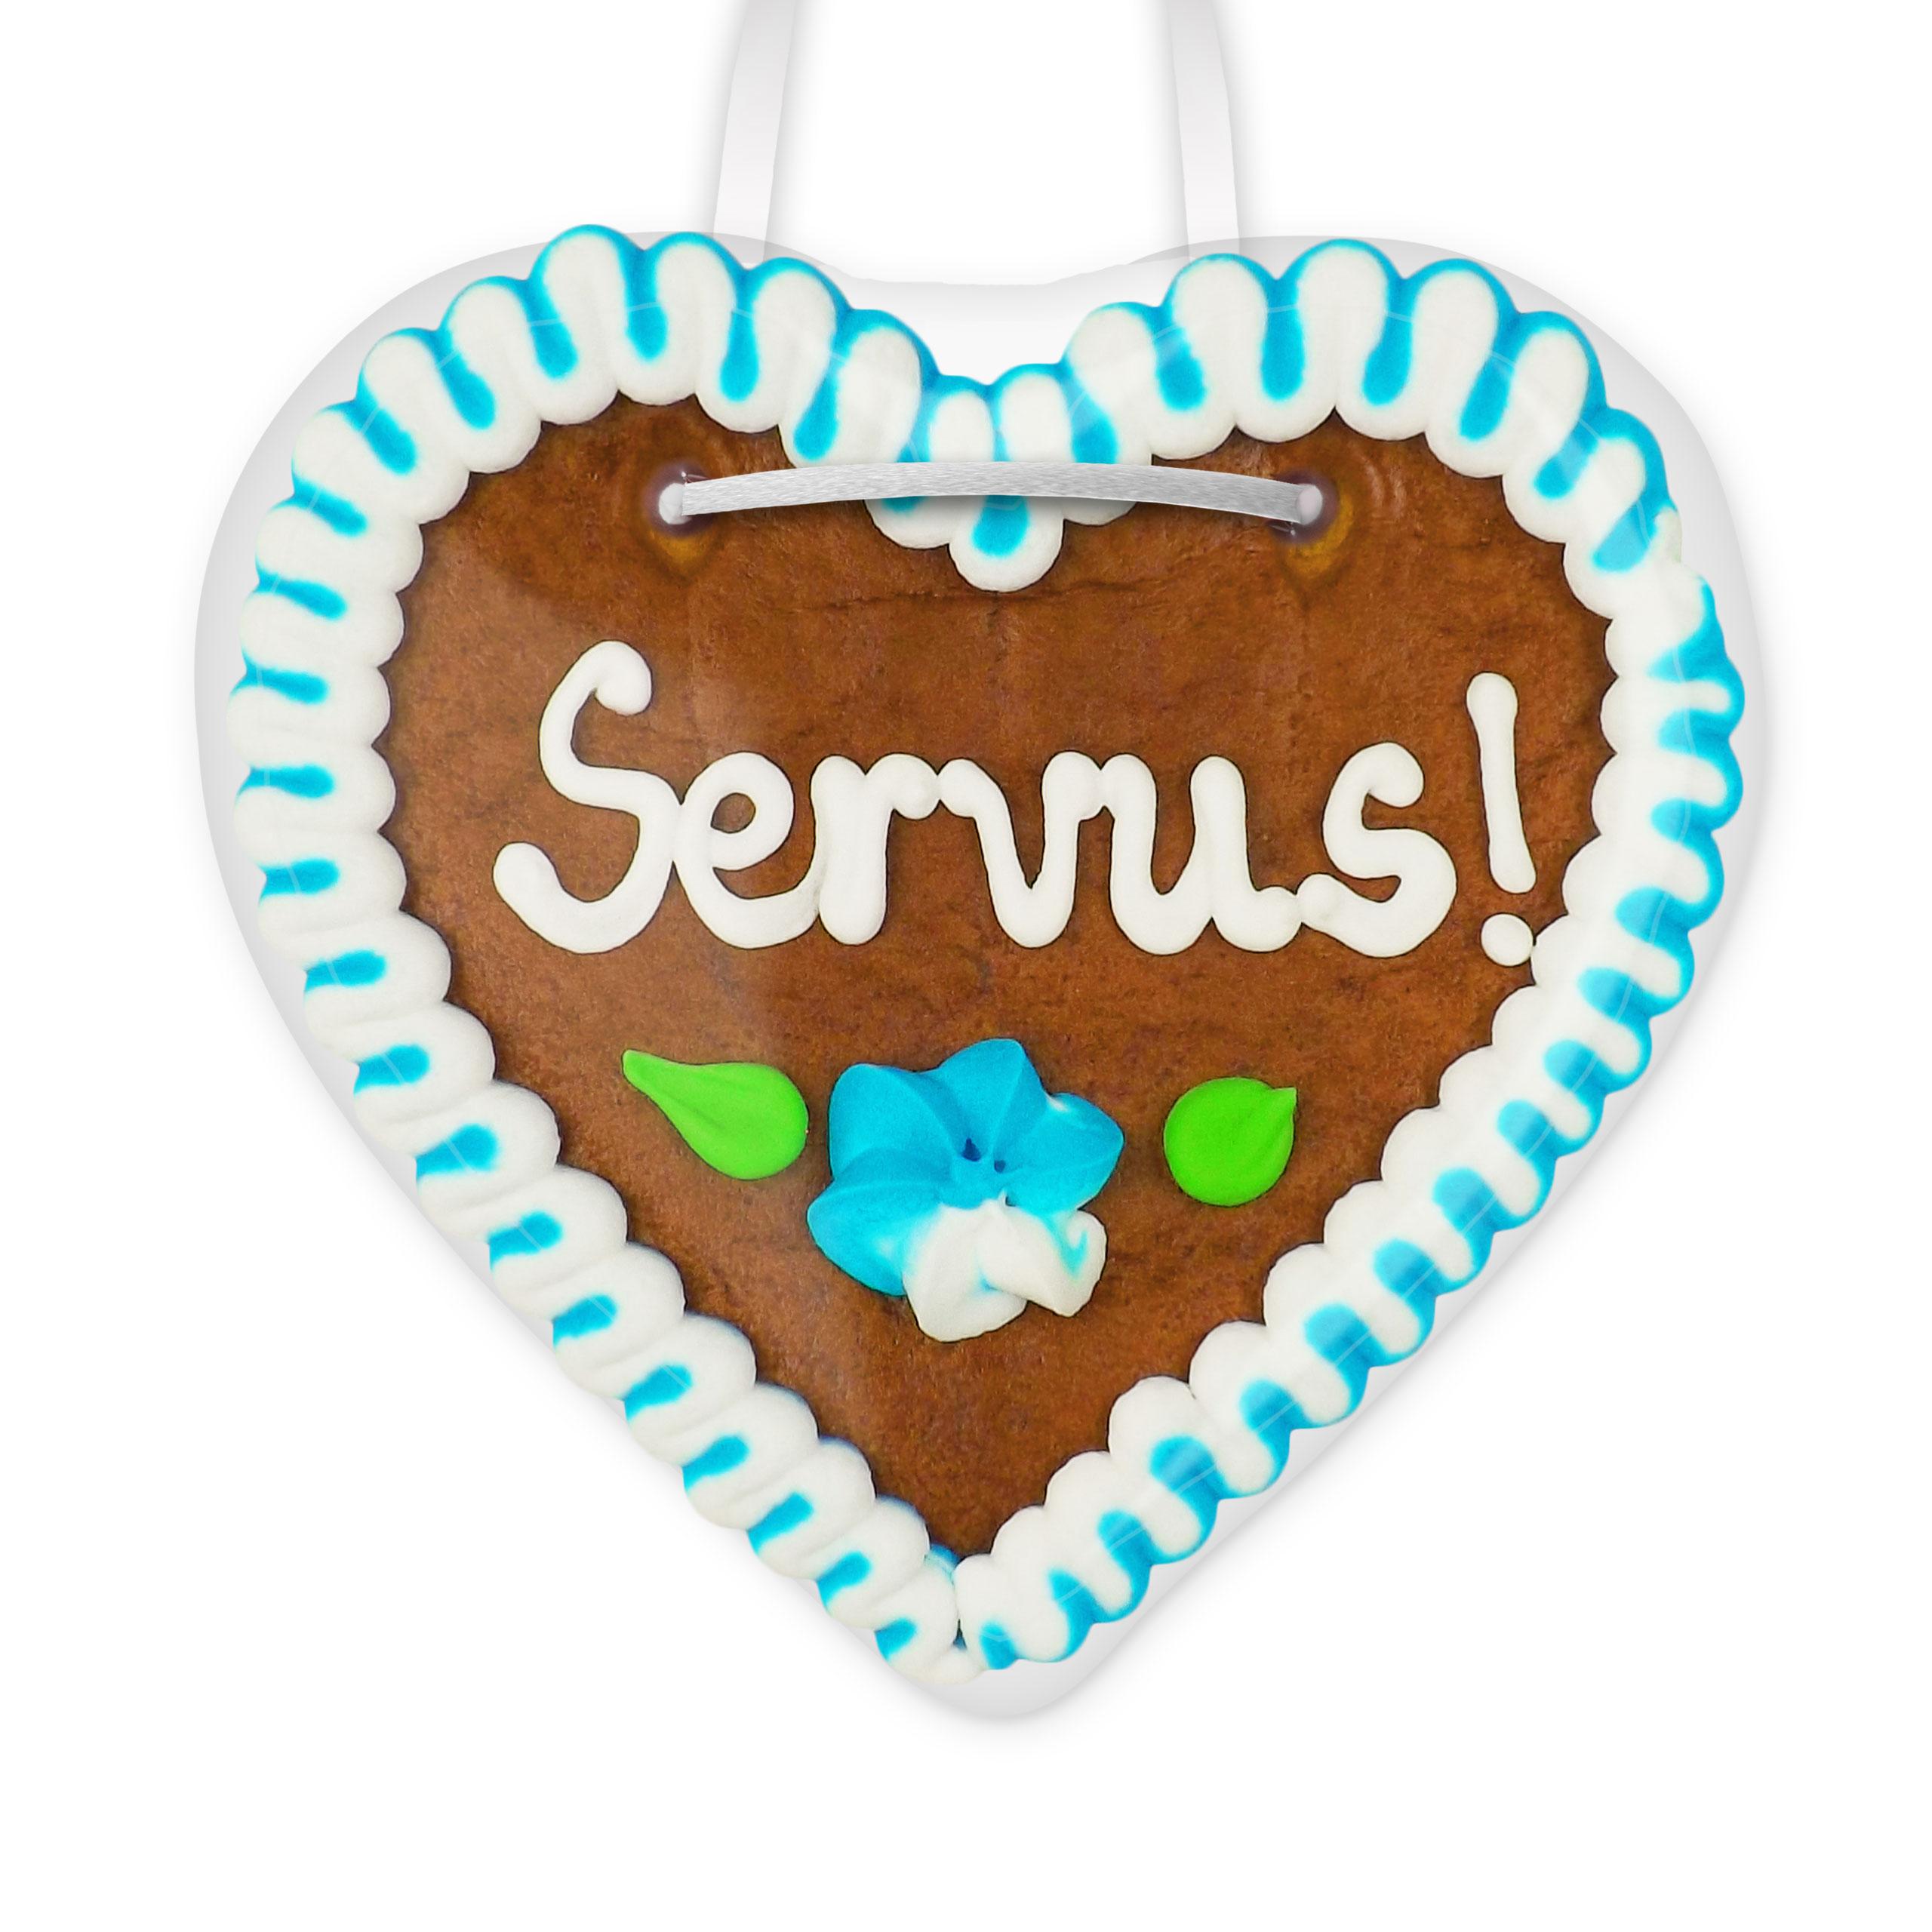 Servus.Tv